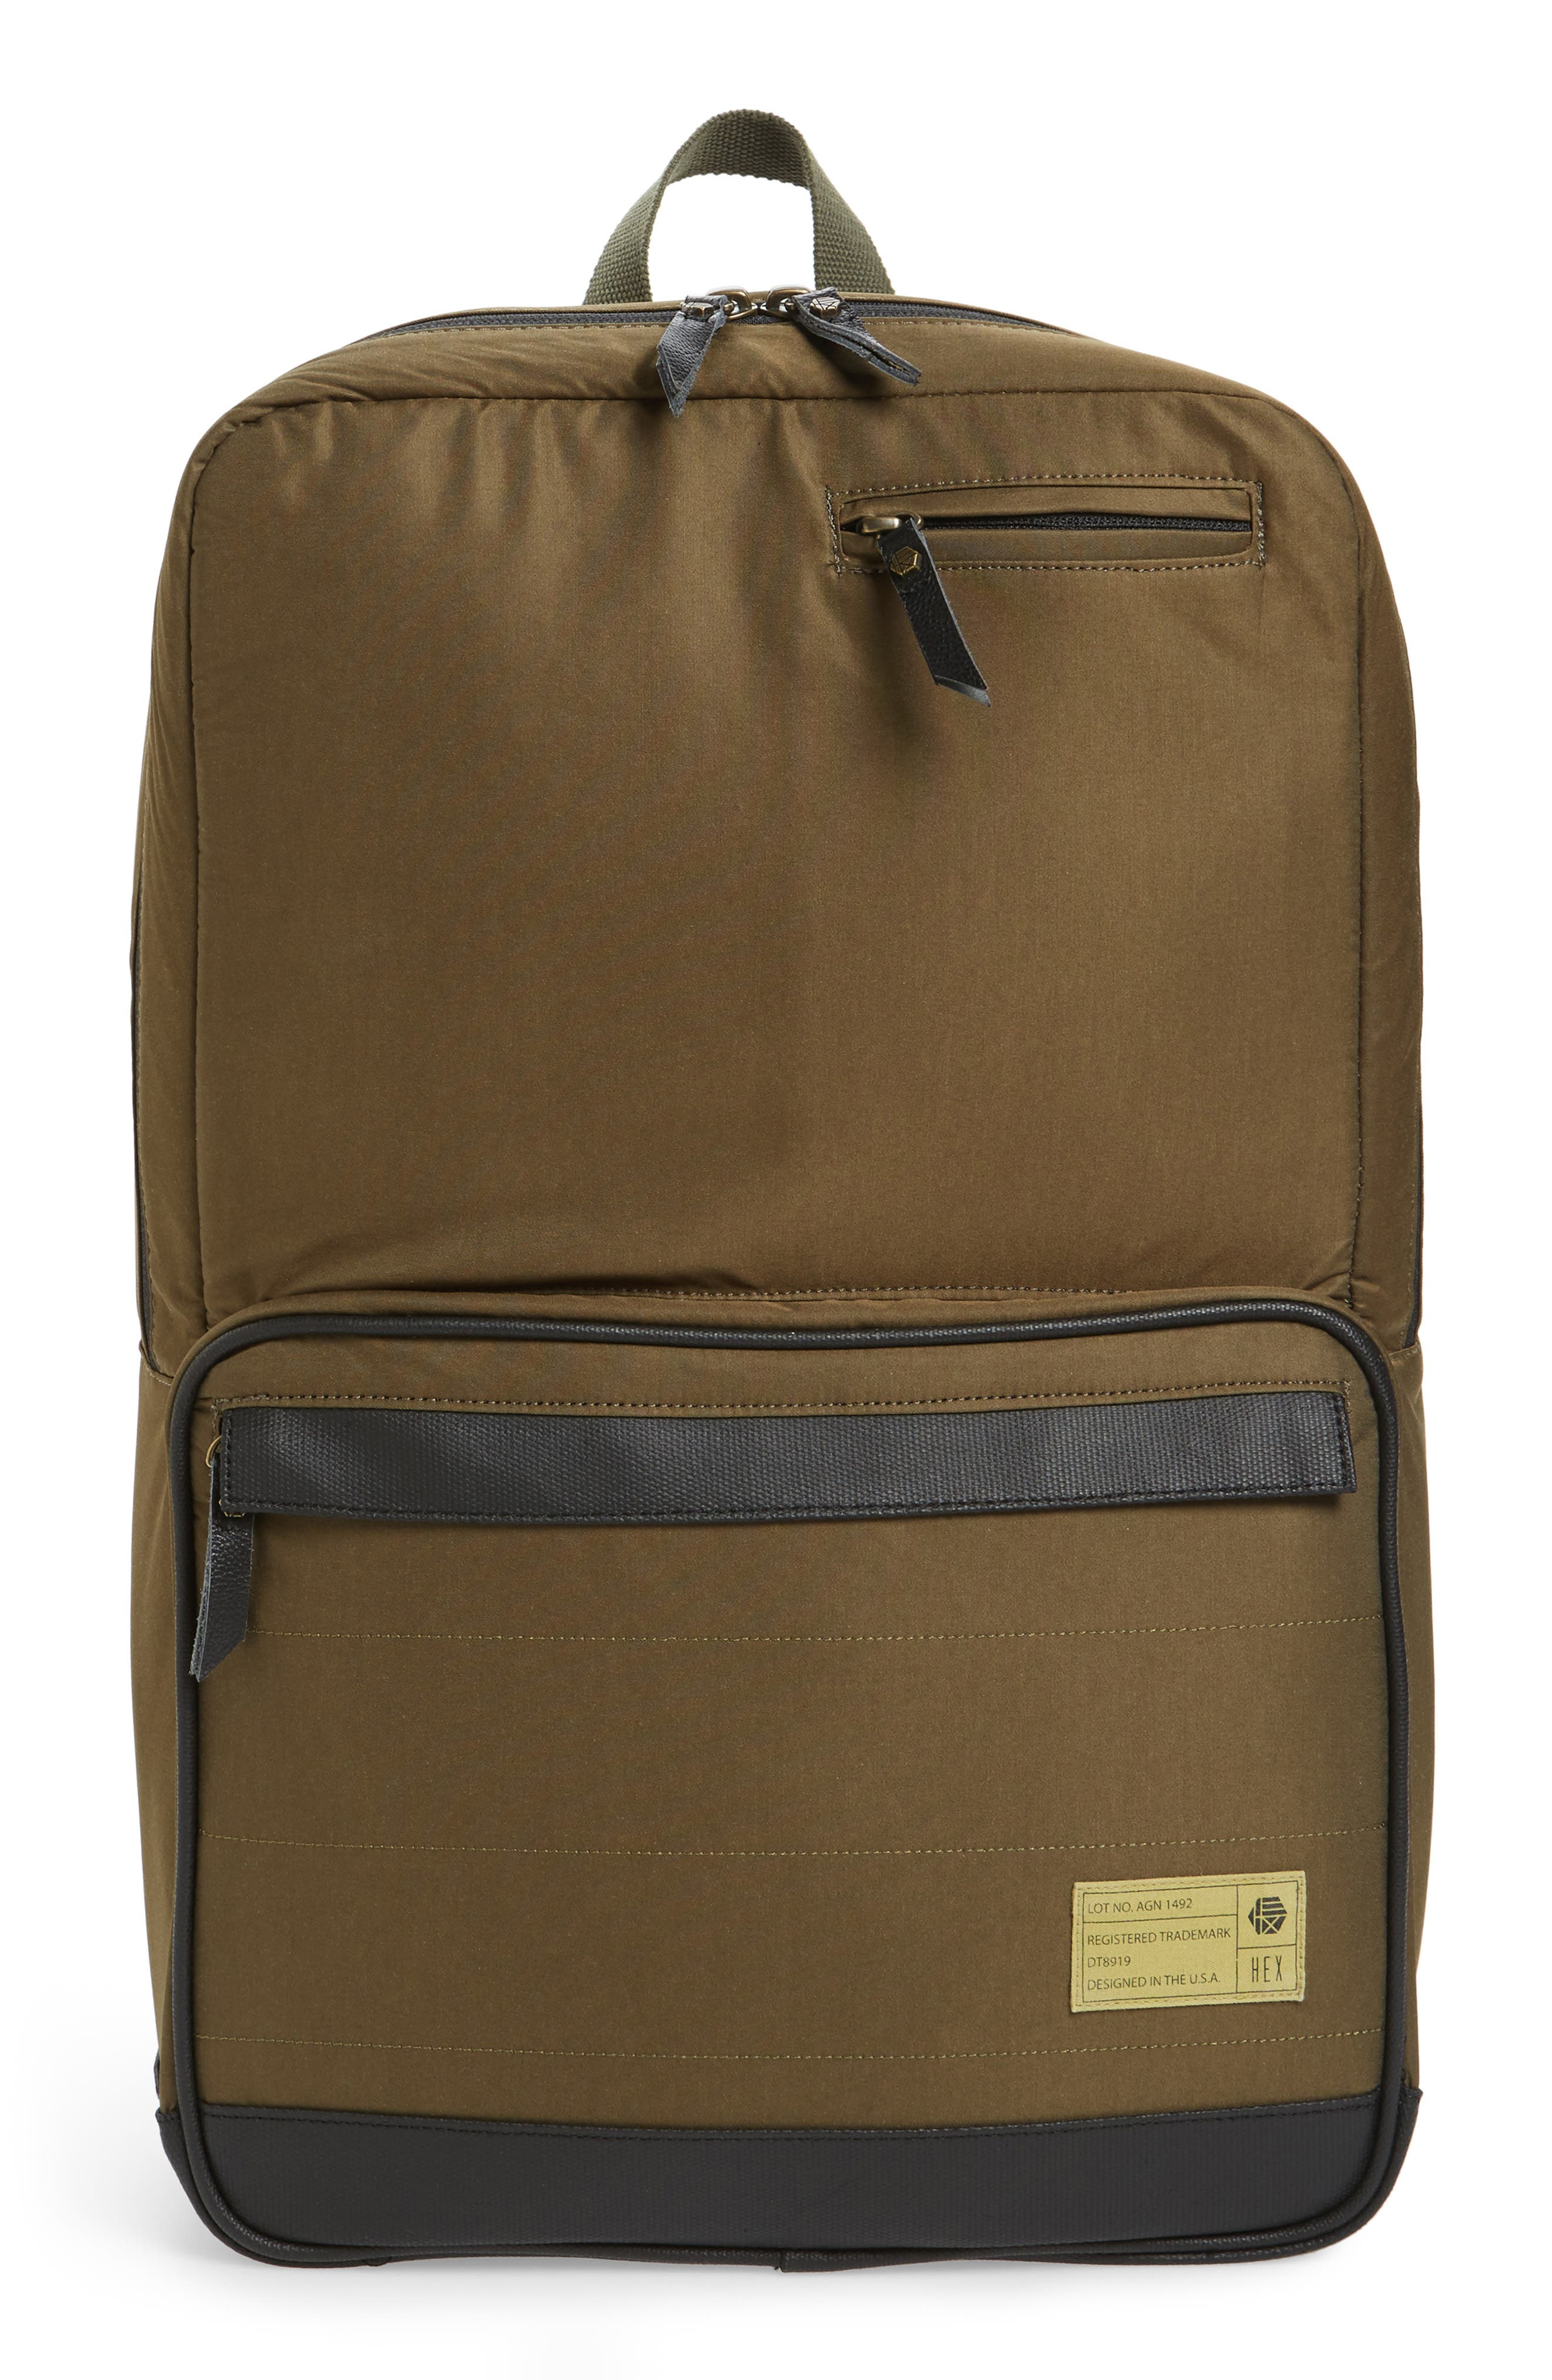 Alternate Image 1 Selected - HEX Radar Origin Water Resistant Commuter/Travel Laptop Backpack